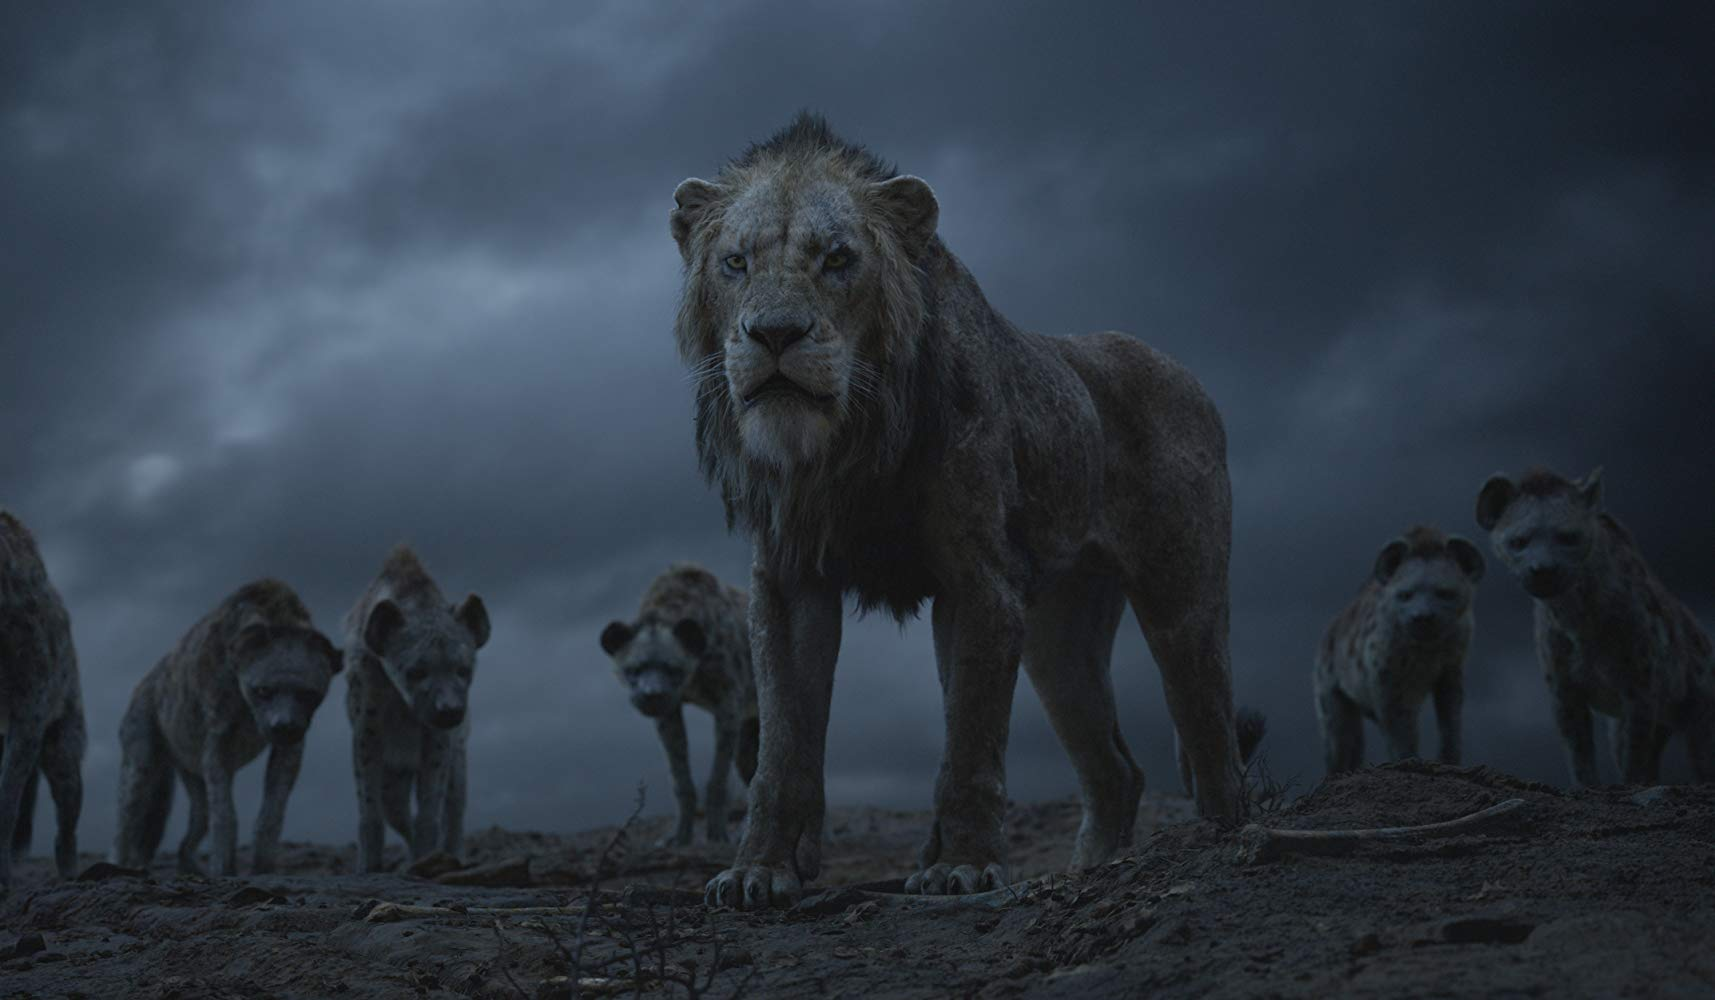 the lion king - 5.jpg